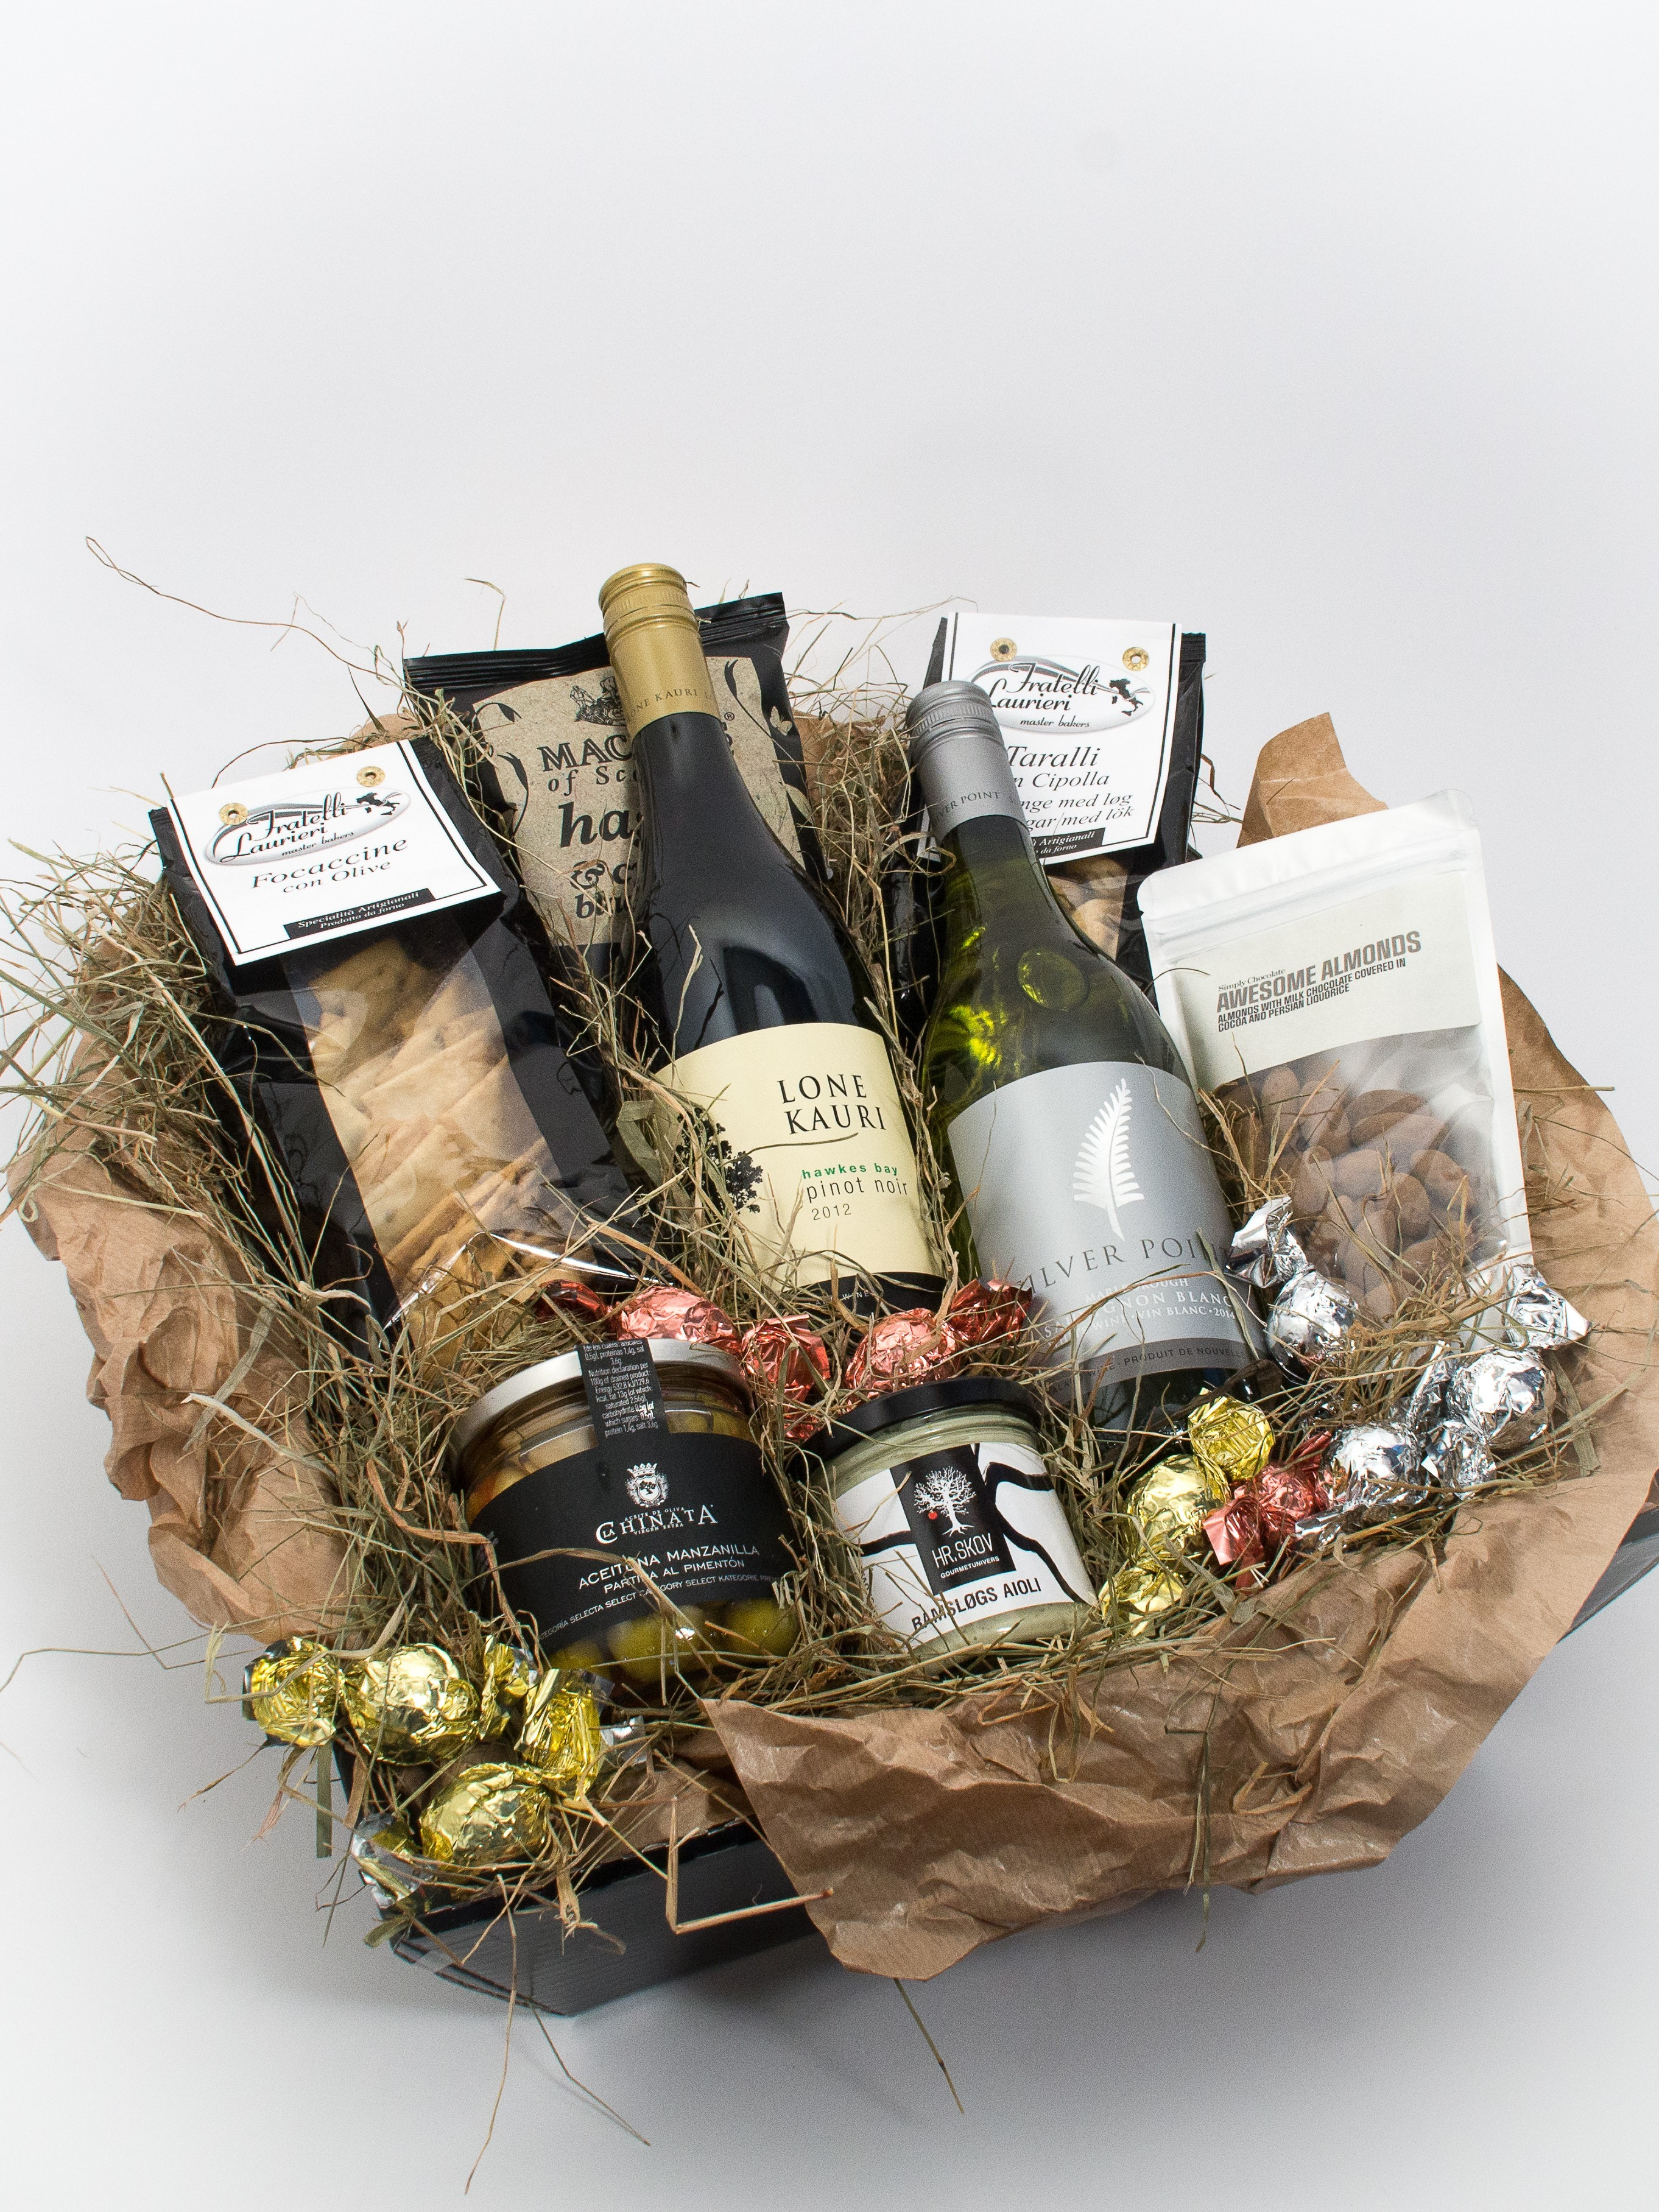 Vin og specialitetskurv